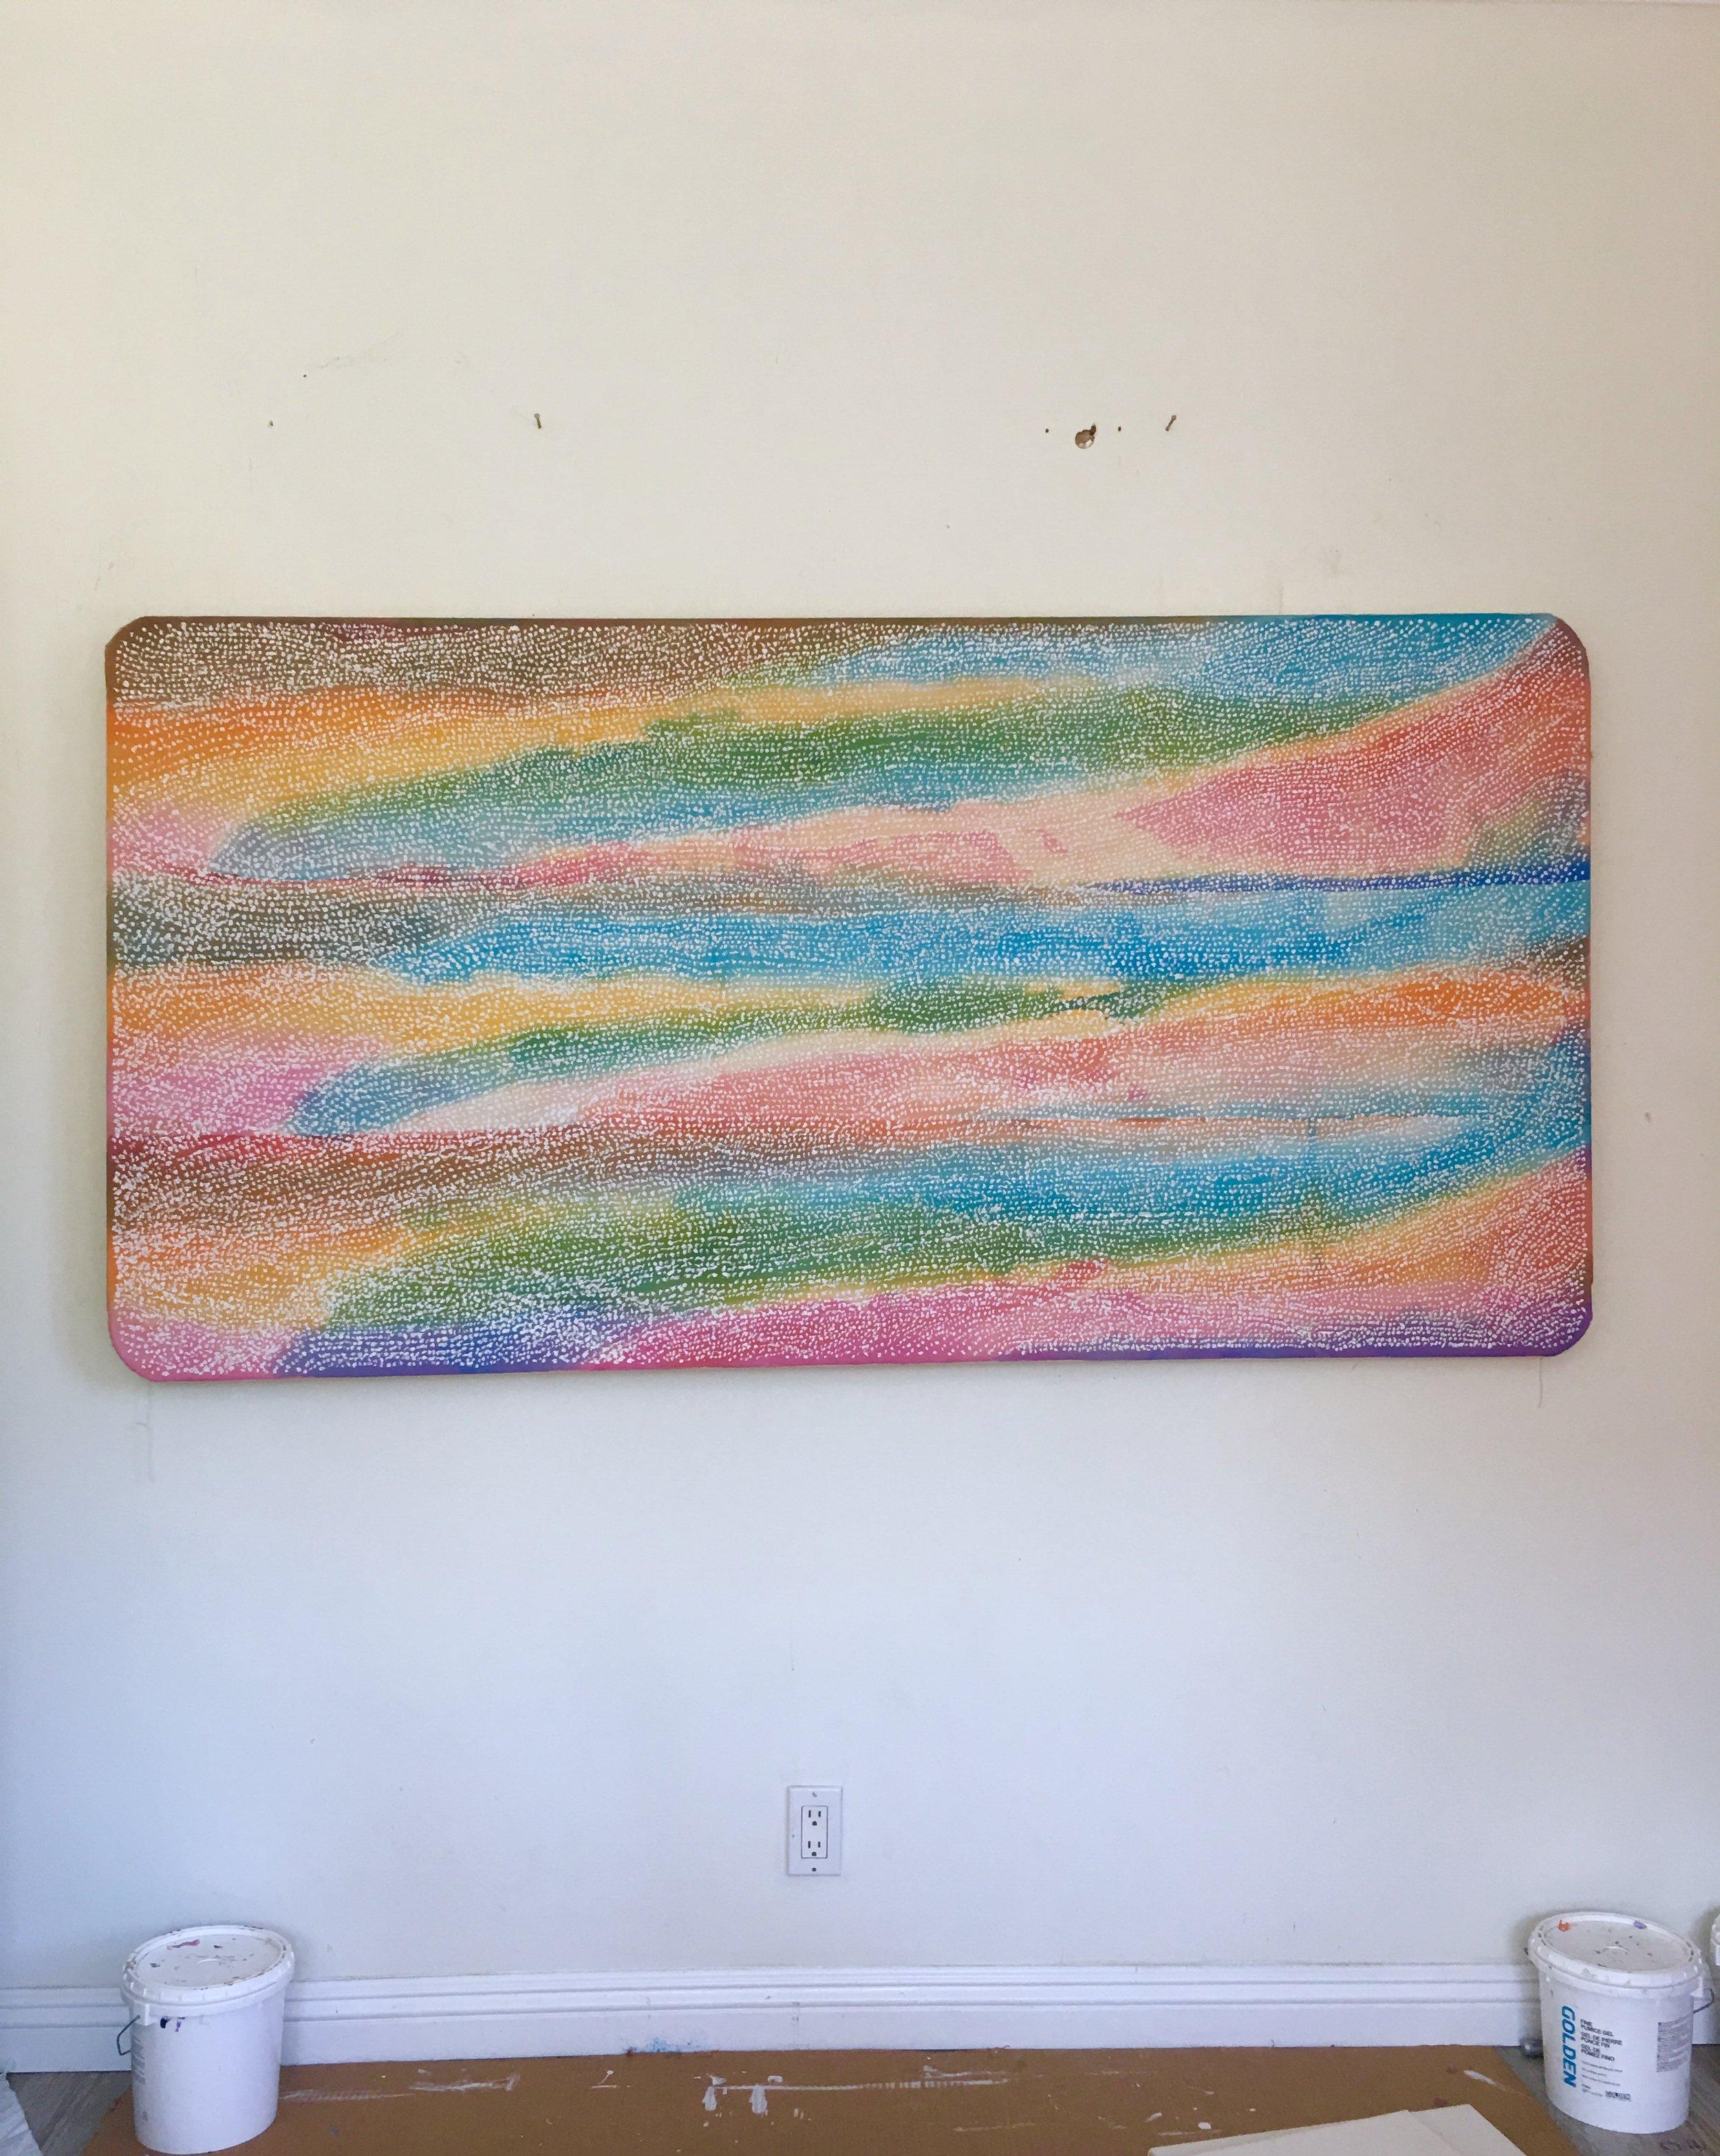 Three Sunrises  , acrylic, pumice, and bleach on canvas, 2018